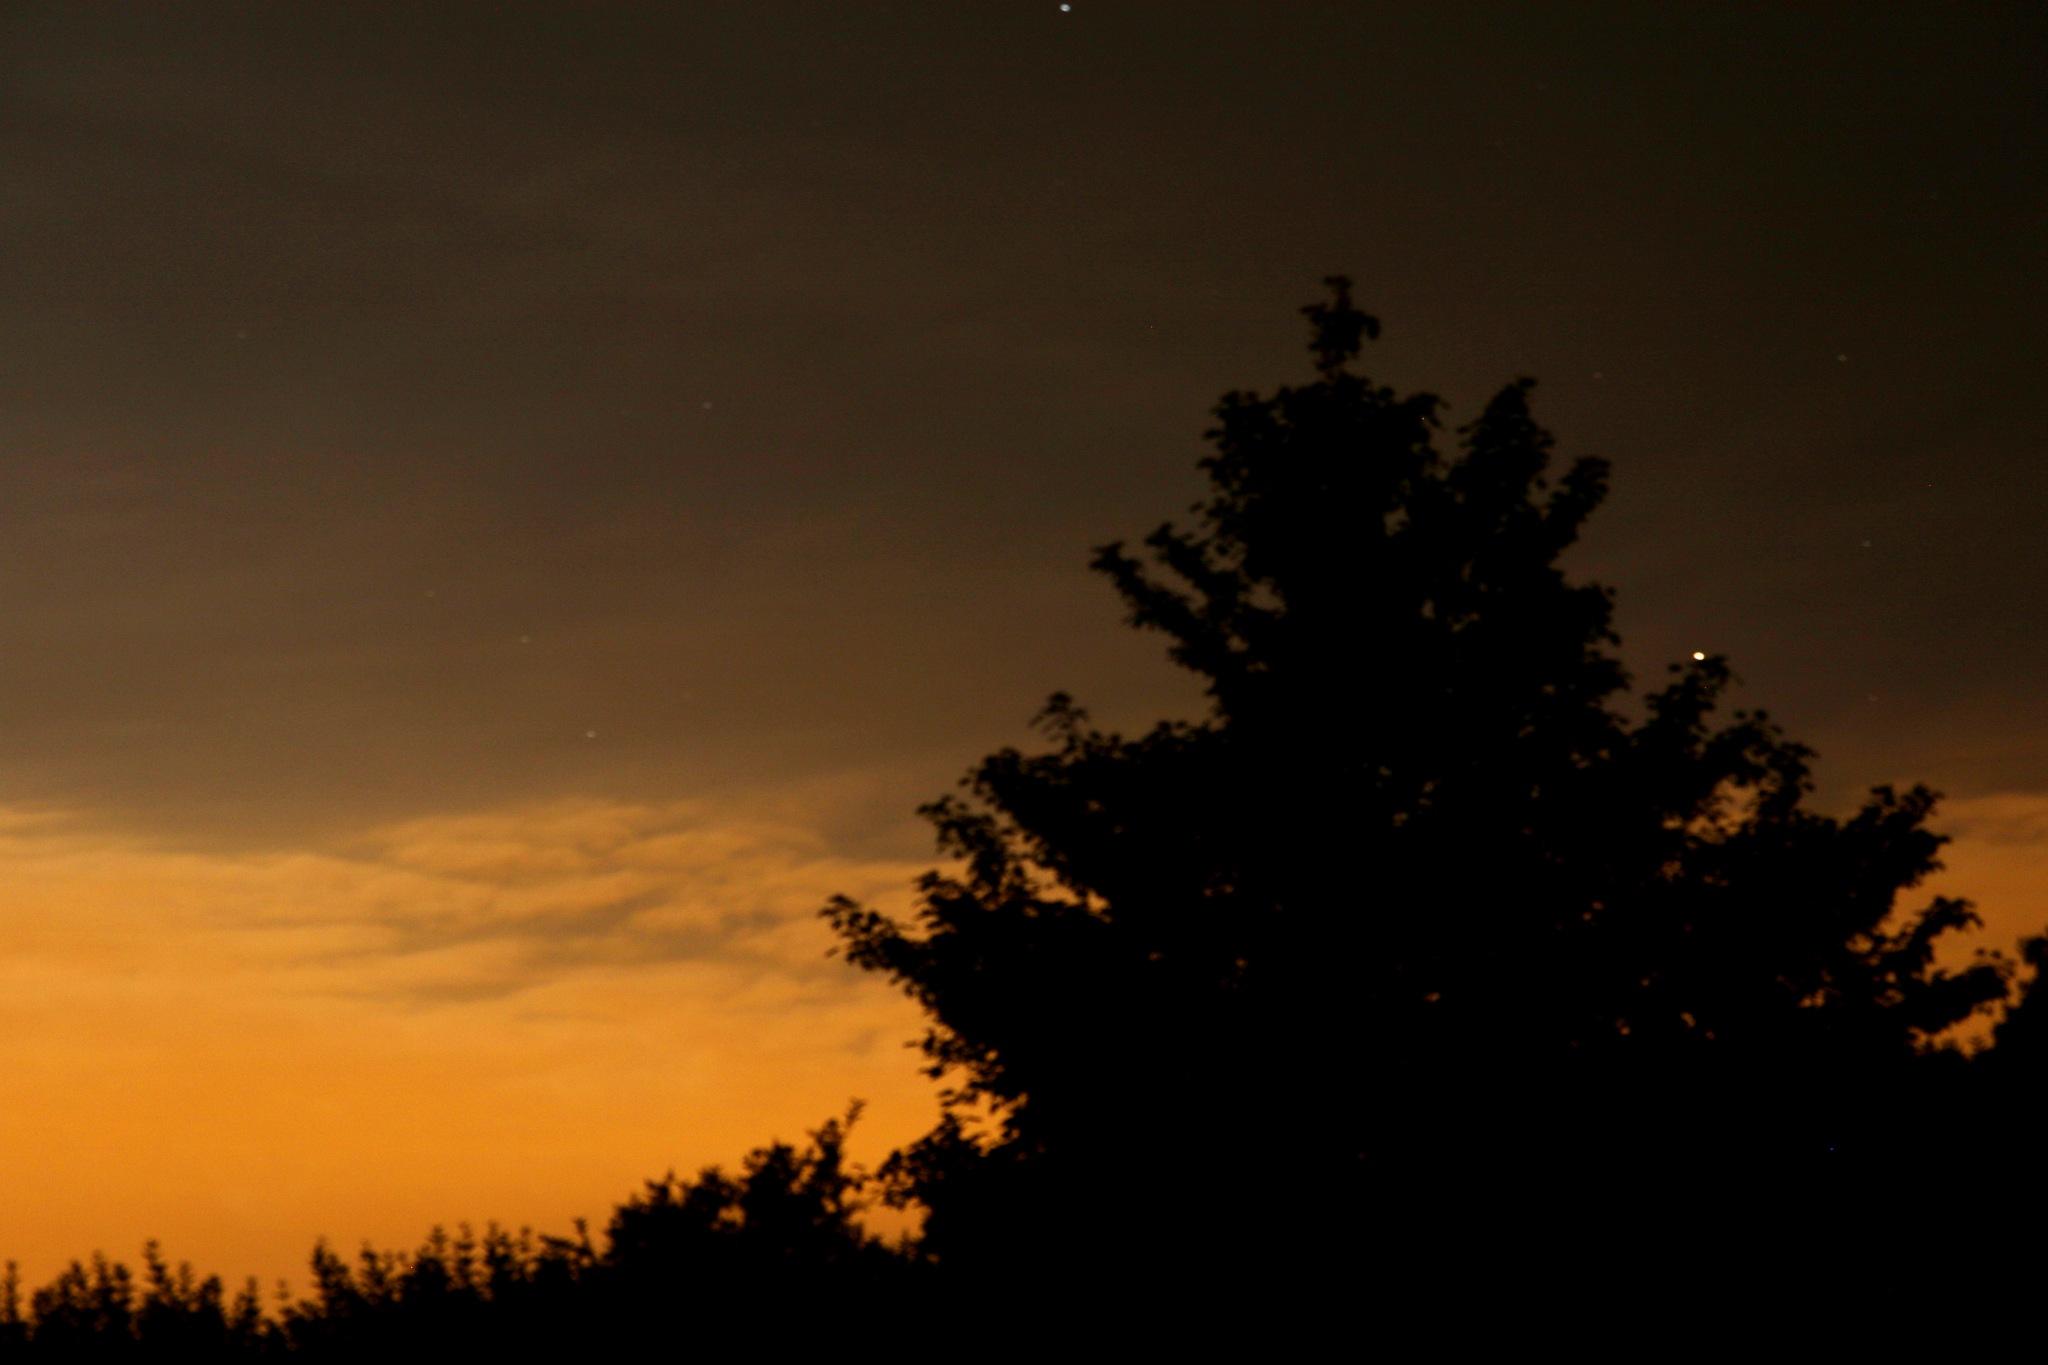 Stars at dusk by Mark Lawton